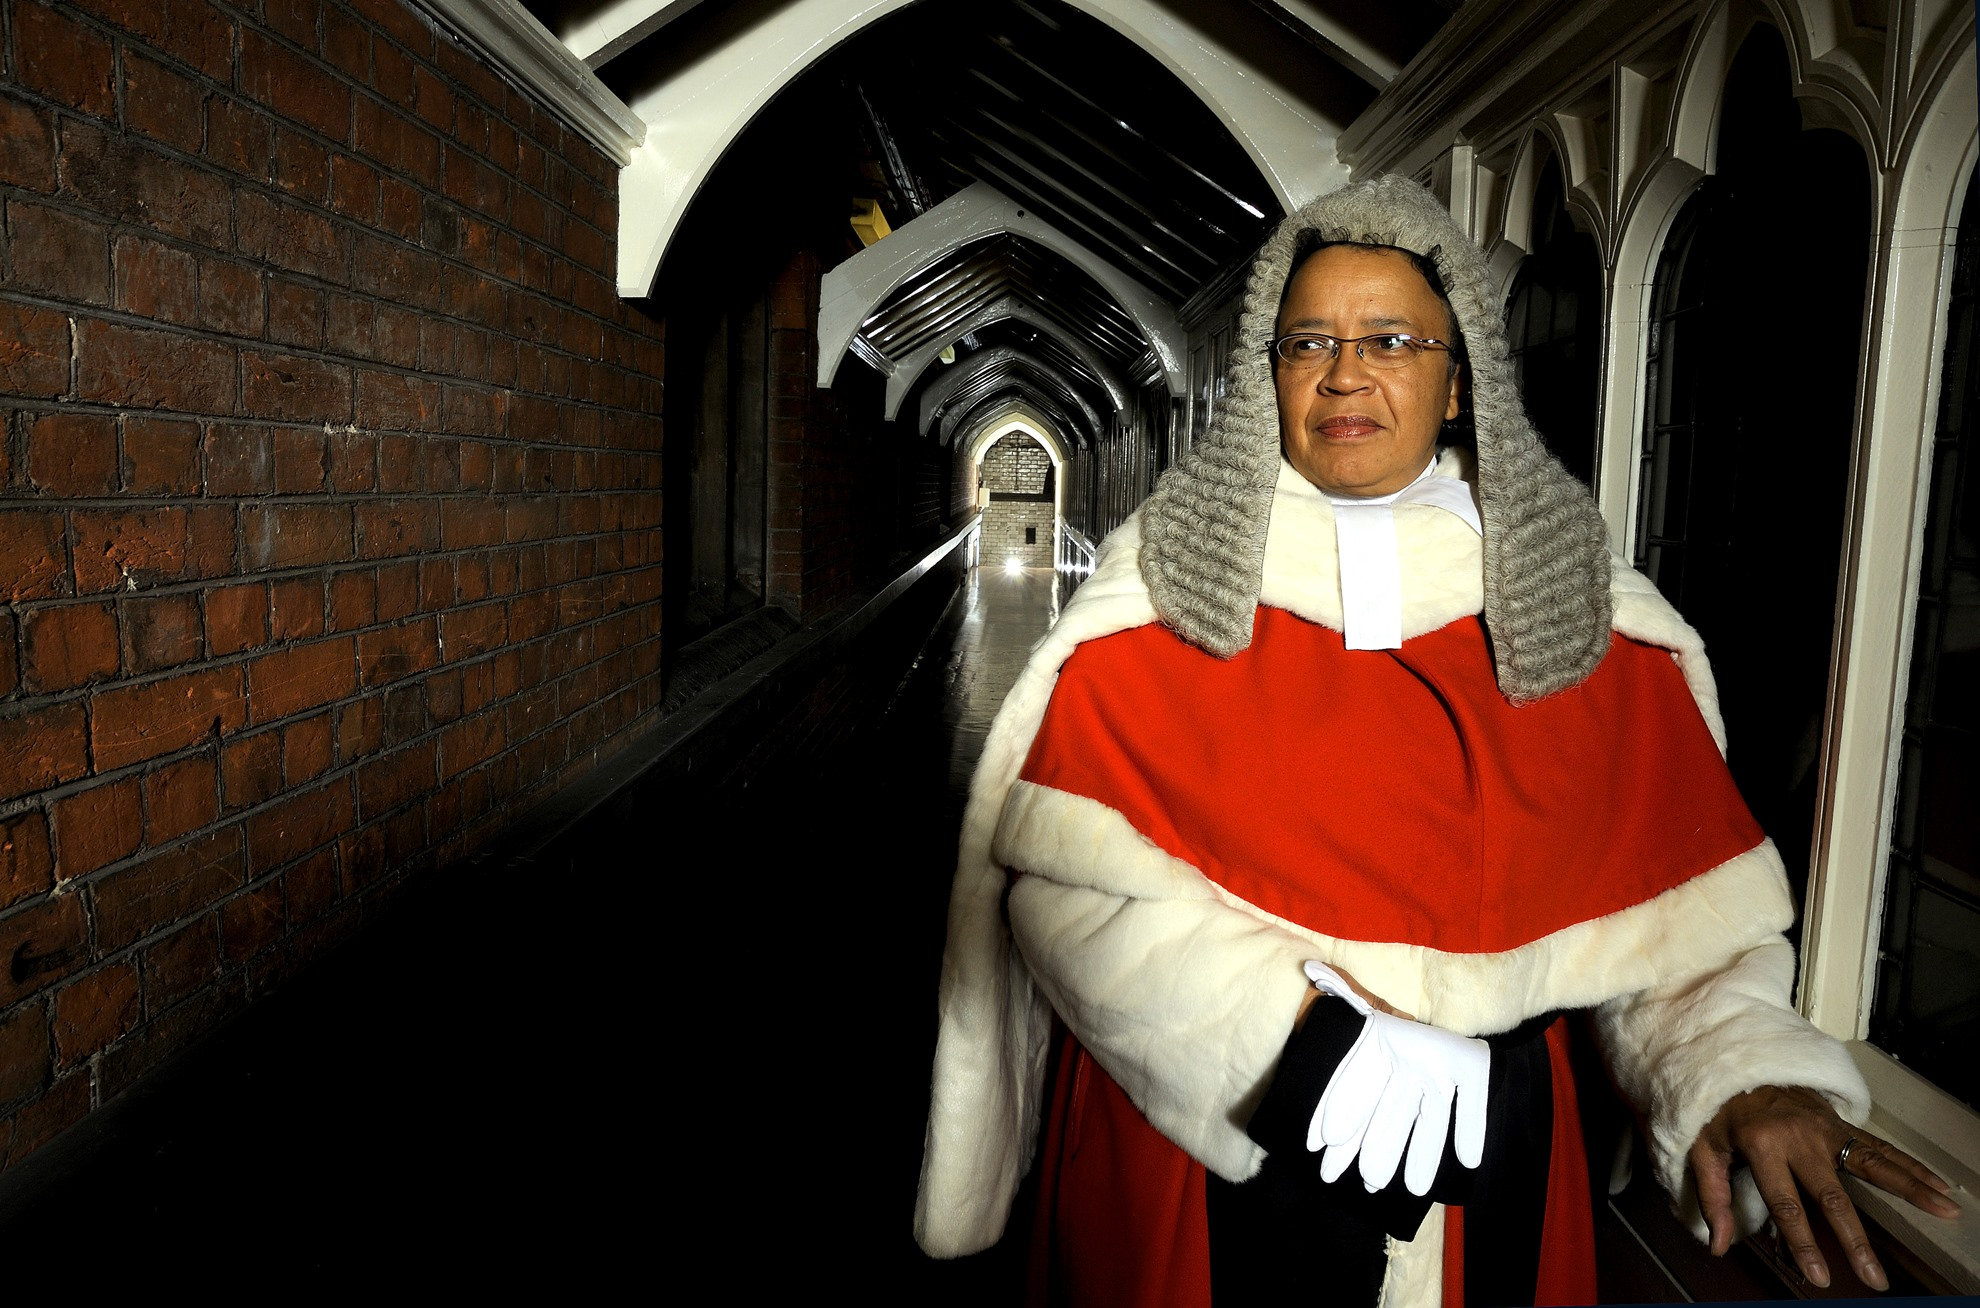 Dame Linda Dodds